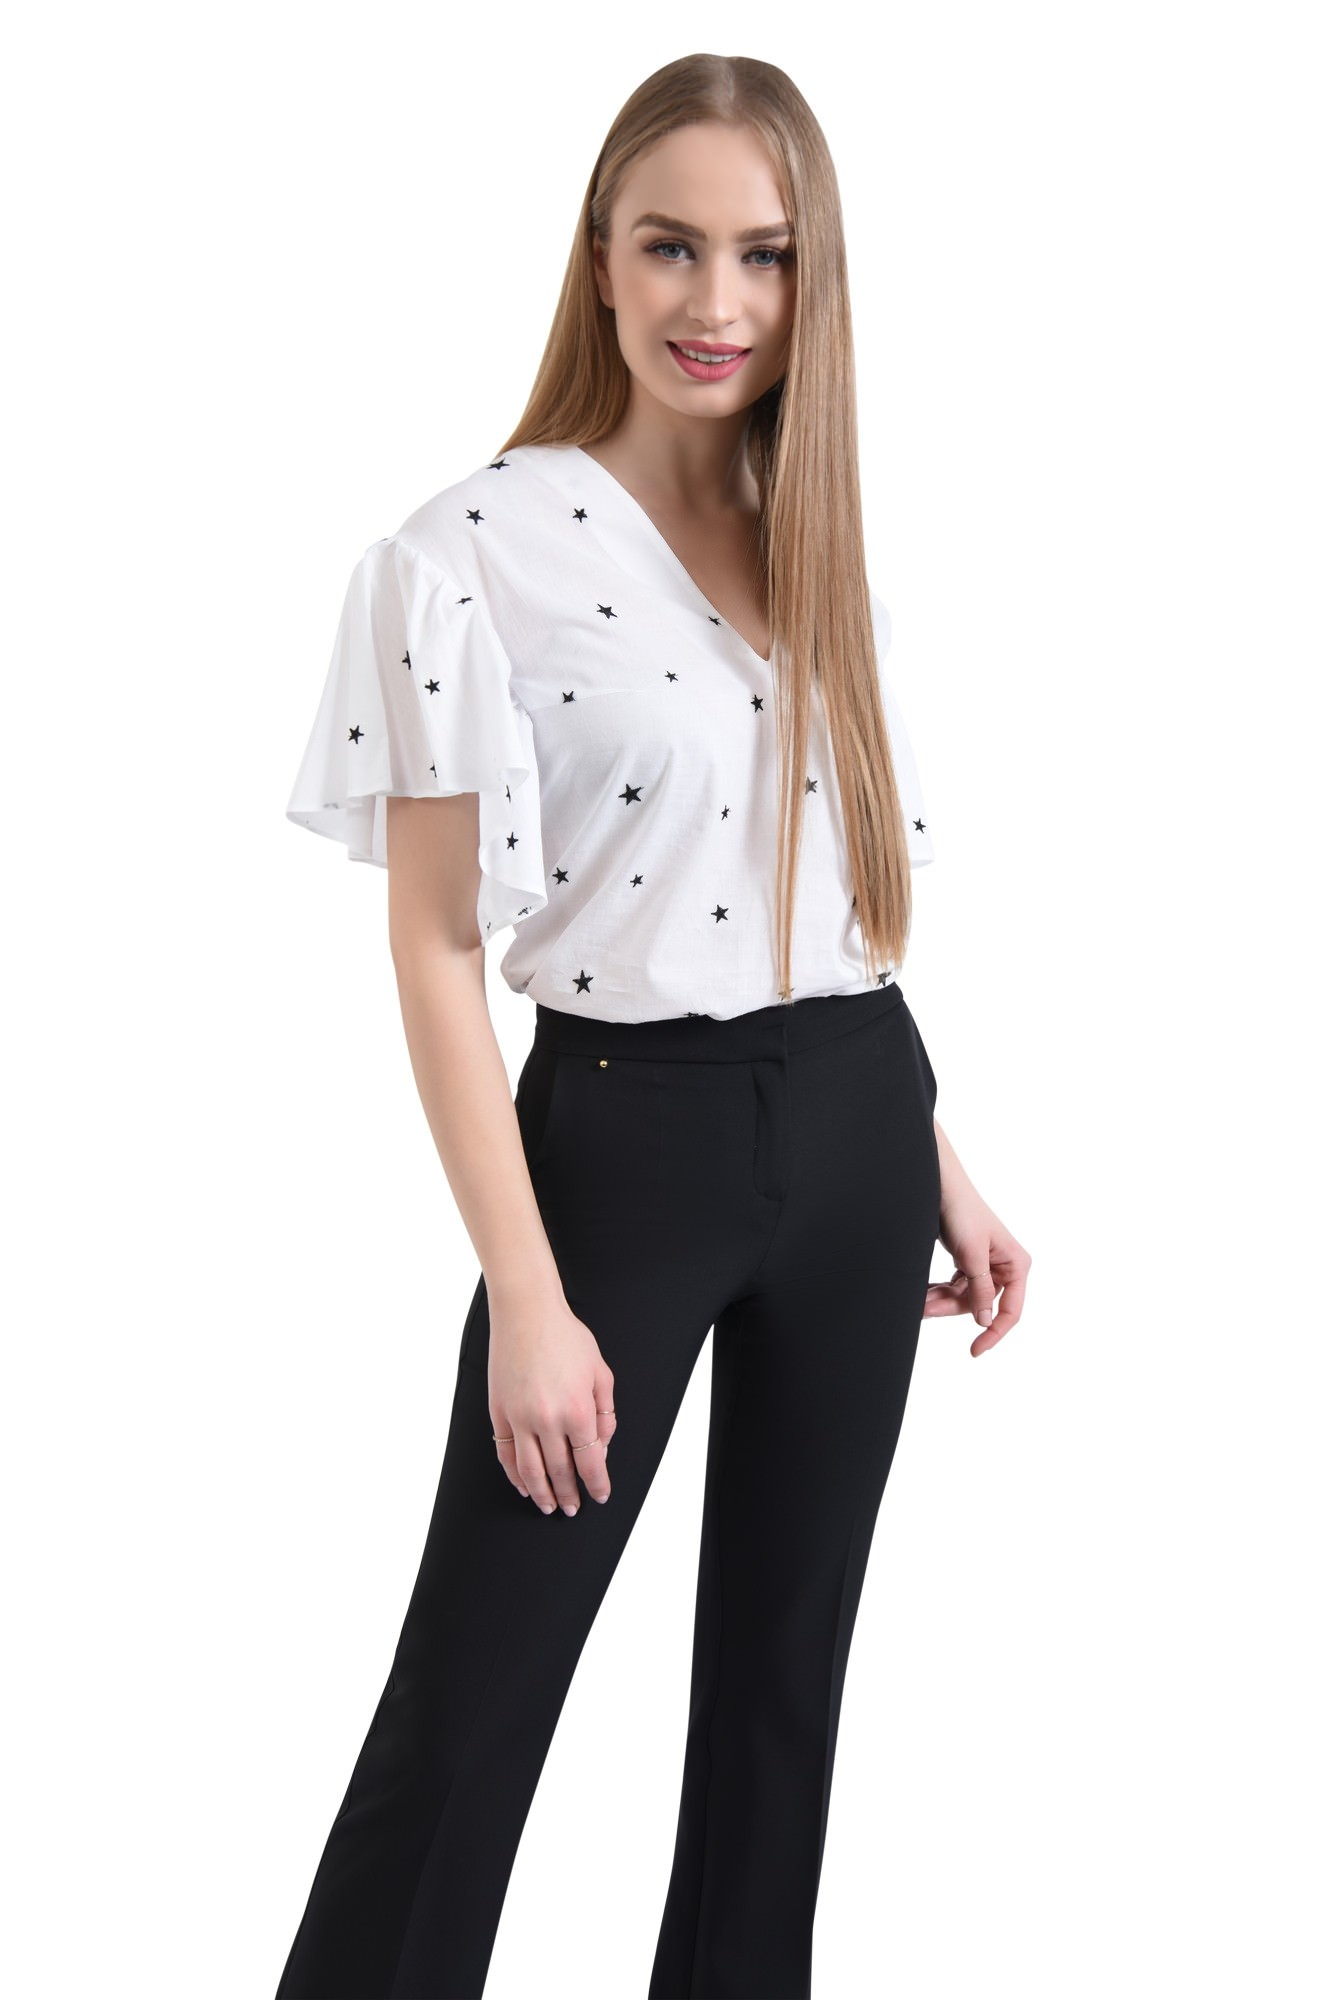 0 - Bluza casual, alb, anchior